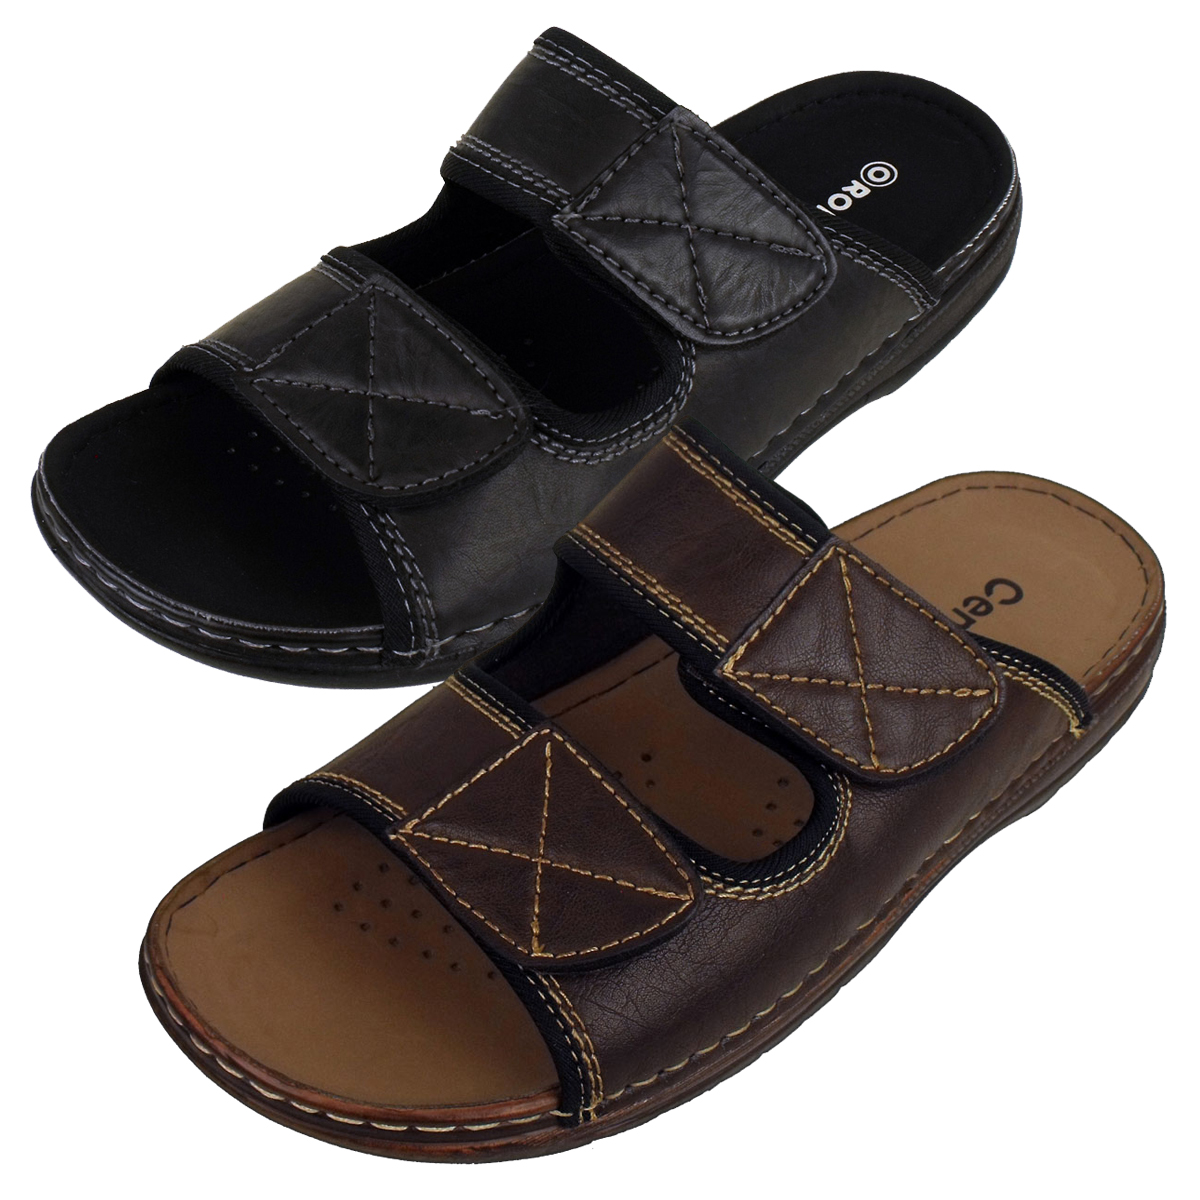 Mens-Mules-Sandals-Faux-Leather-Smart-Slip-On-Velcro-Sandal-Beach